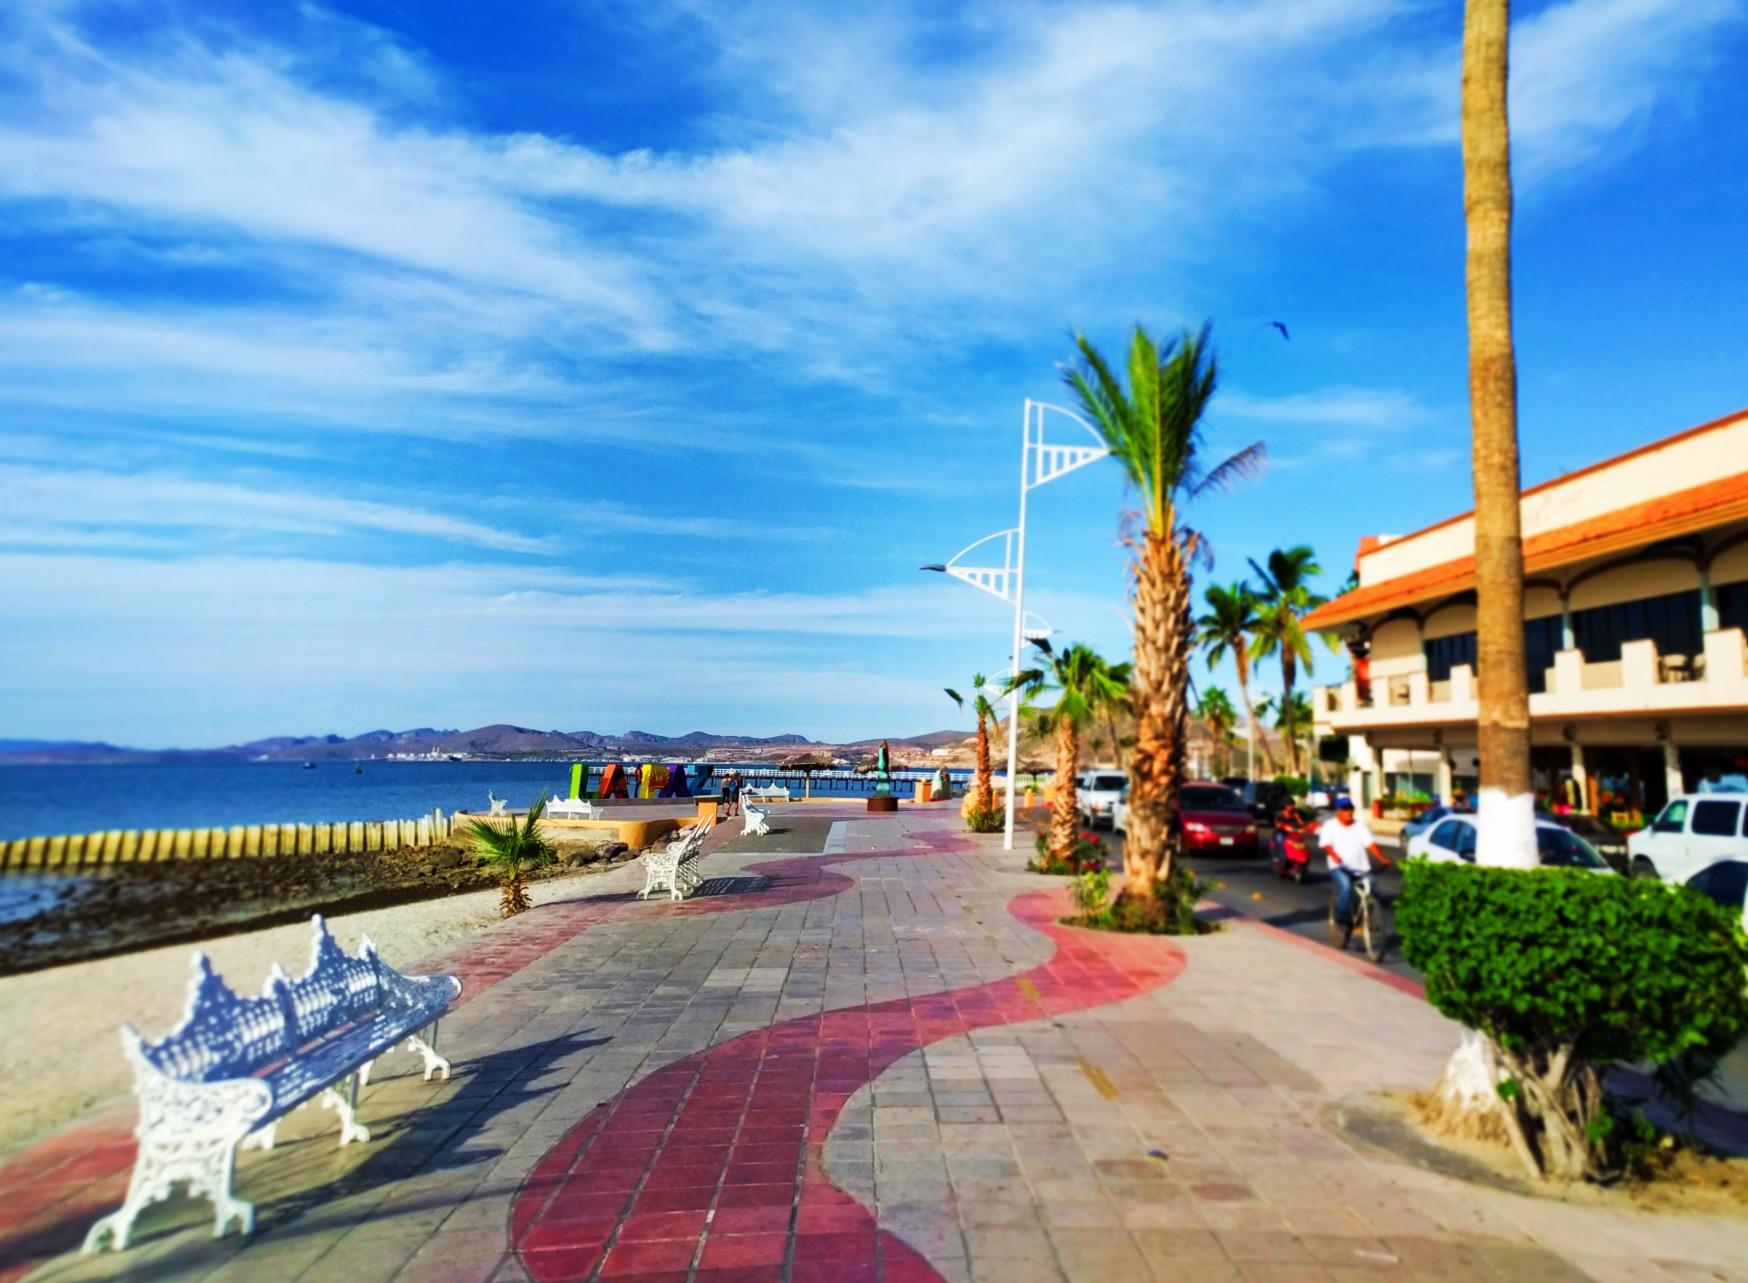 La-Paz-sign-on-Malecon-by-Hotel-Perla-1.jpg